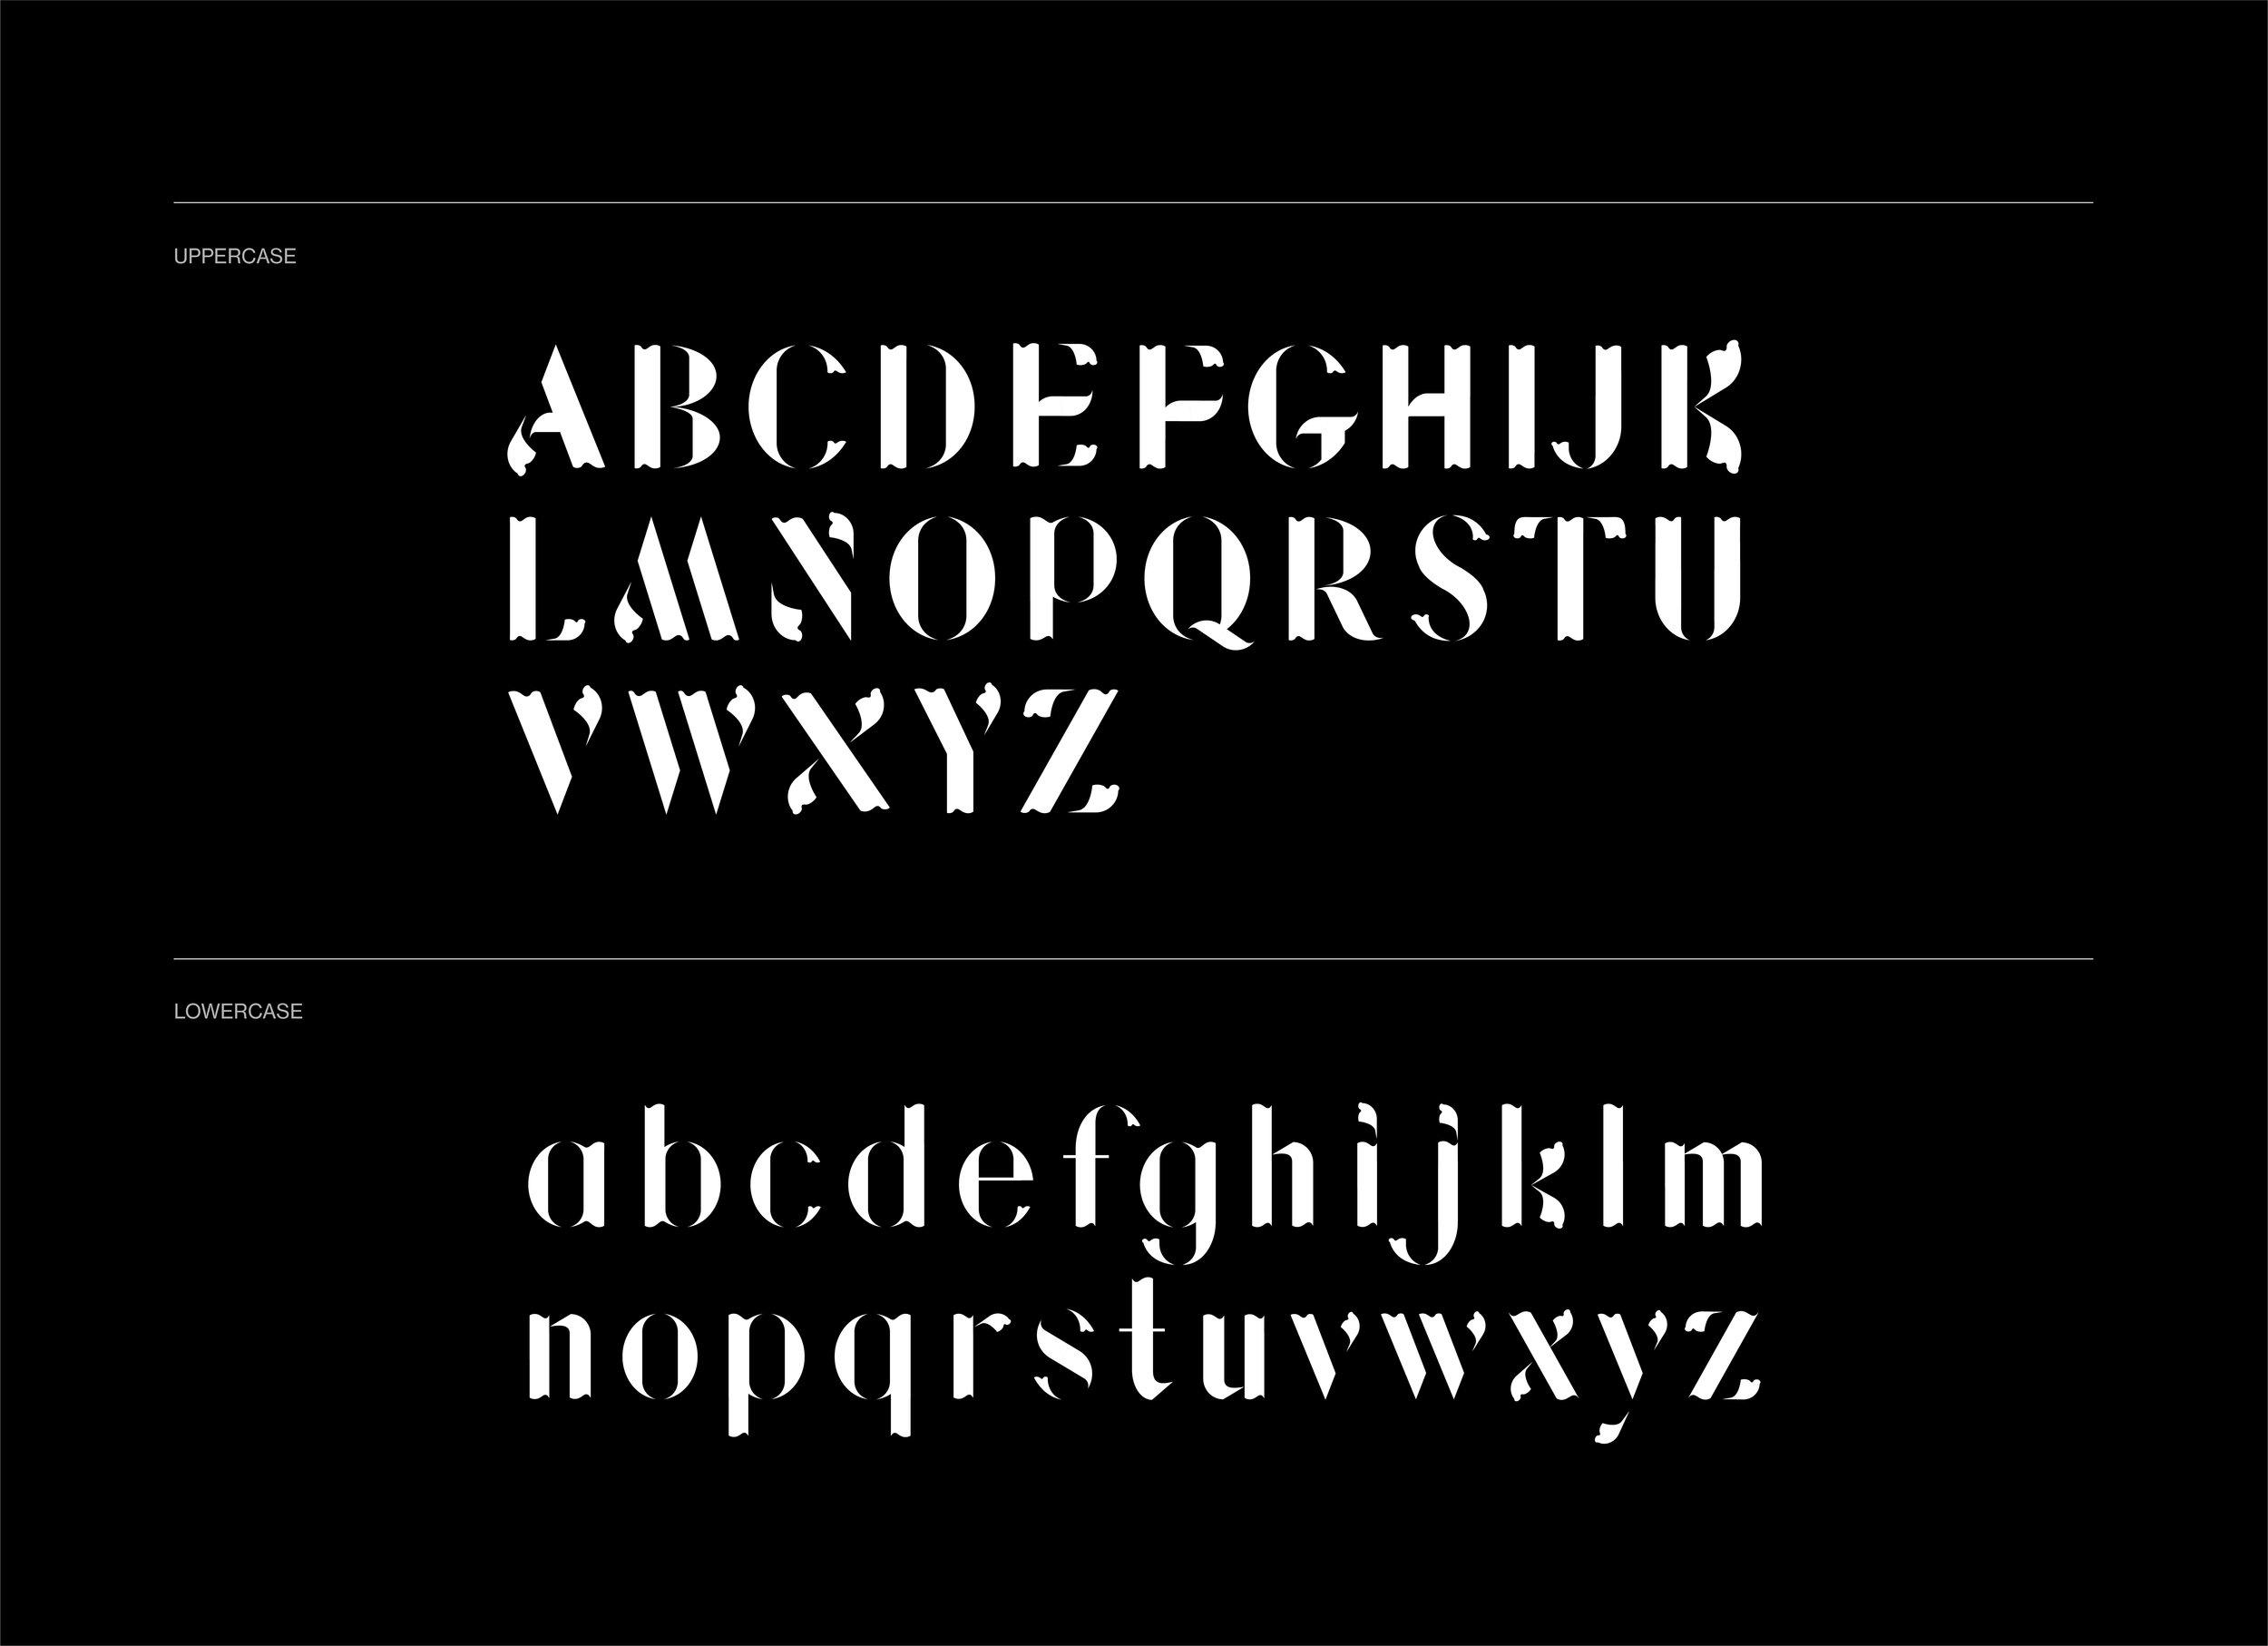 callas typeface rework-08.jpg